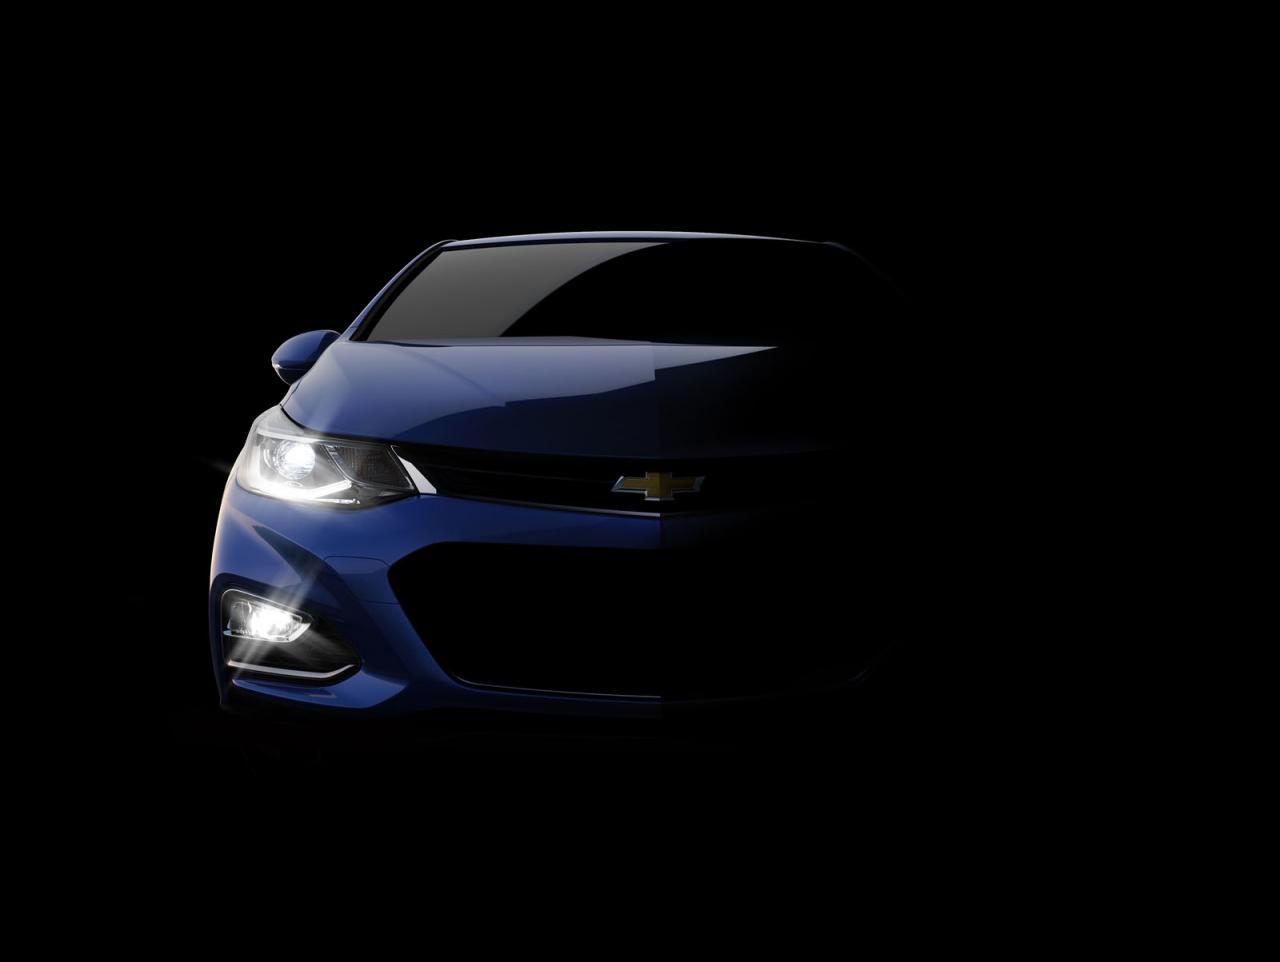 Chevrolet Cruze 2016 teaser/тизер